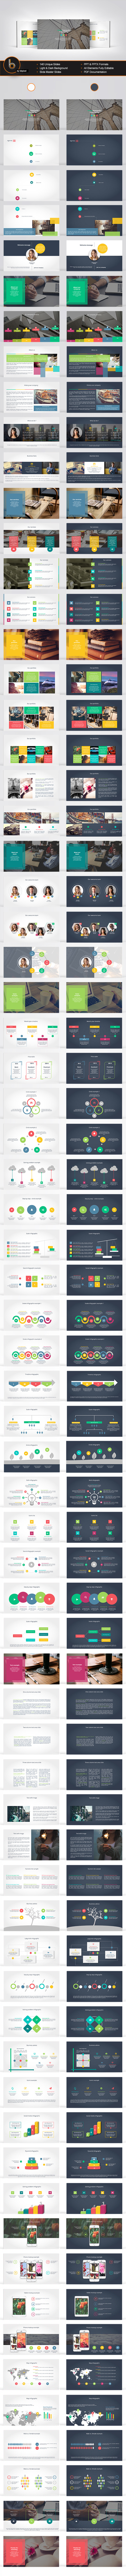 Energy - PowerPoint Presentation Template